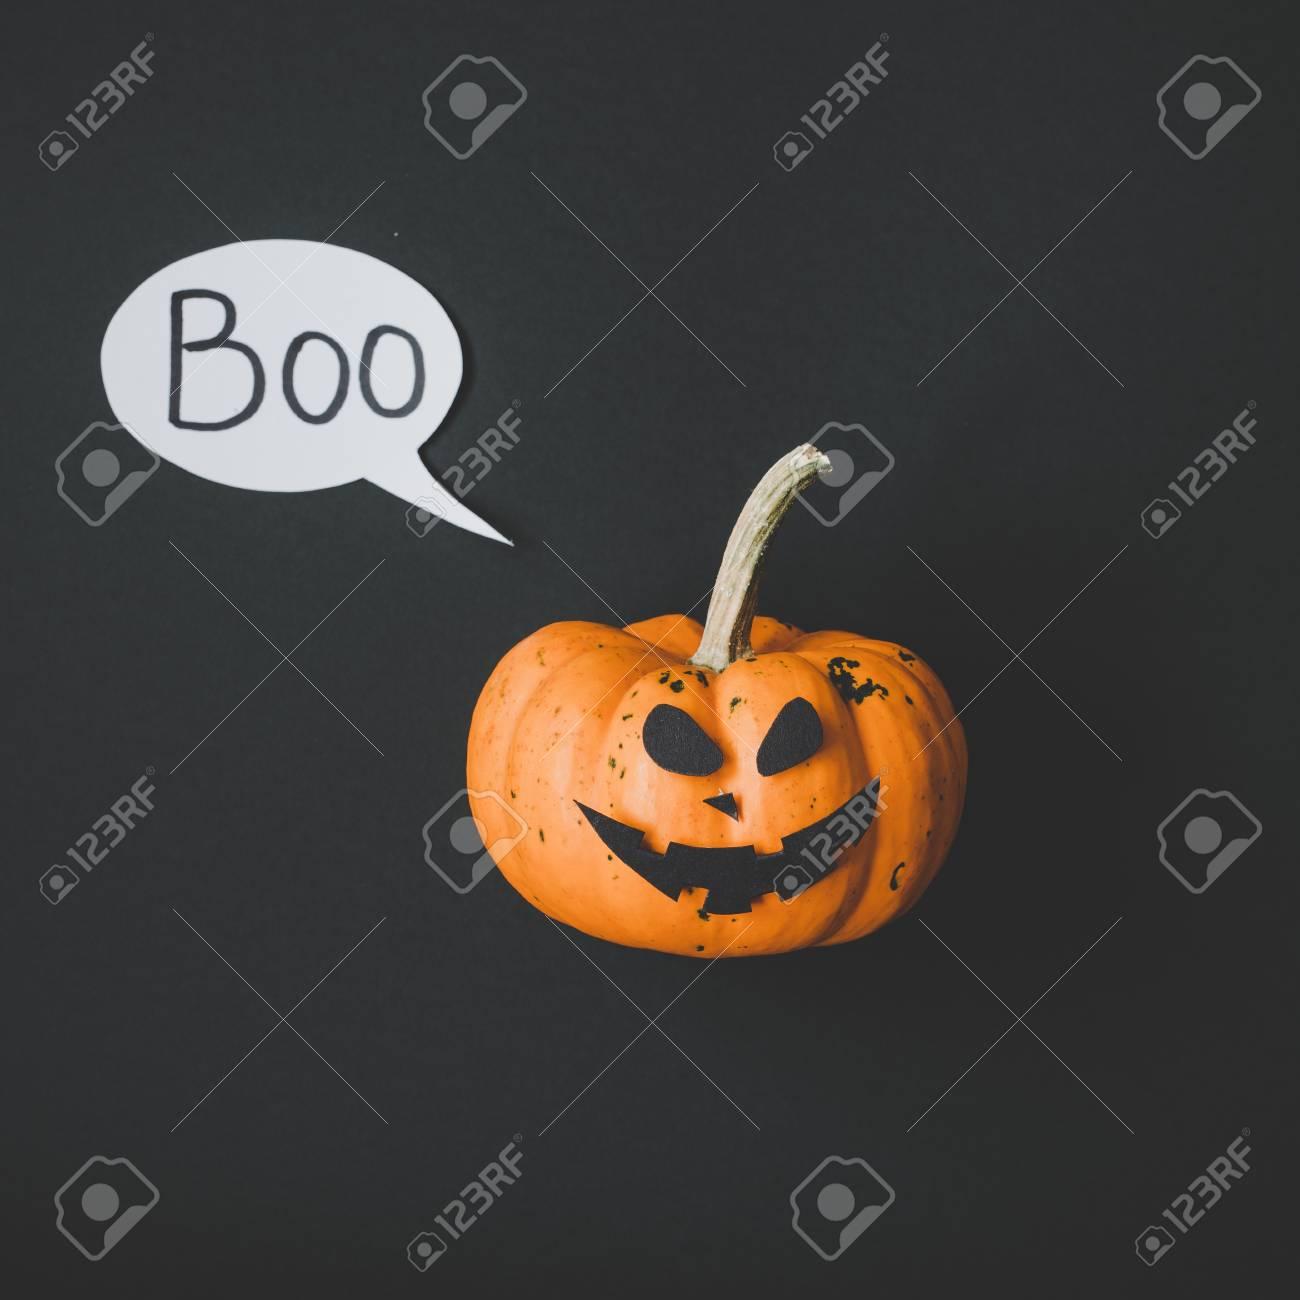 happy halloween. funny halloween pumpkin jack o lantern on black